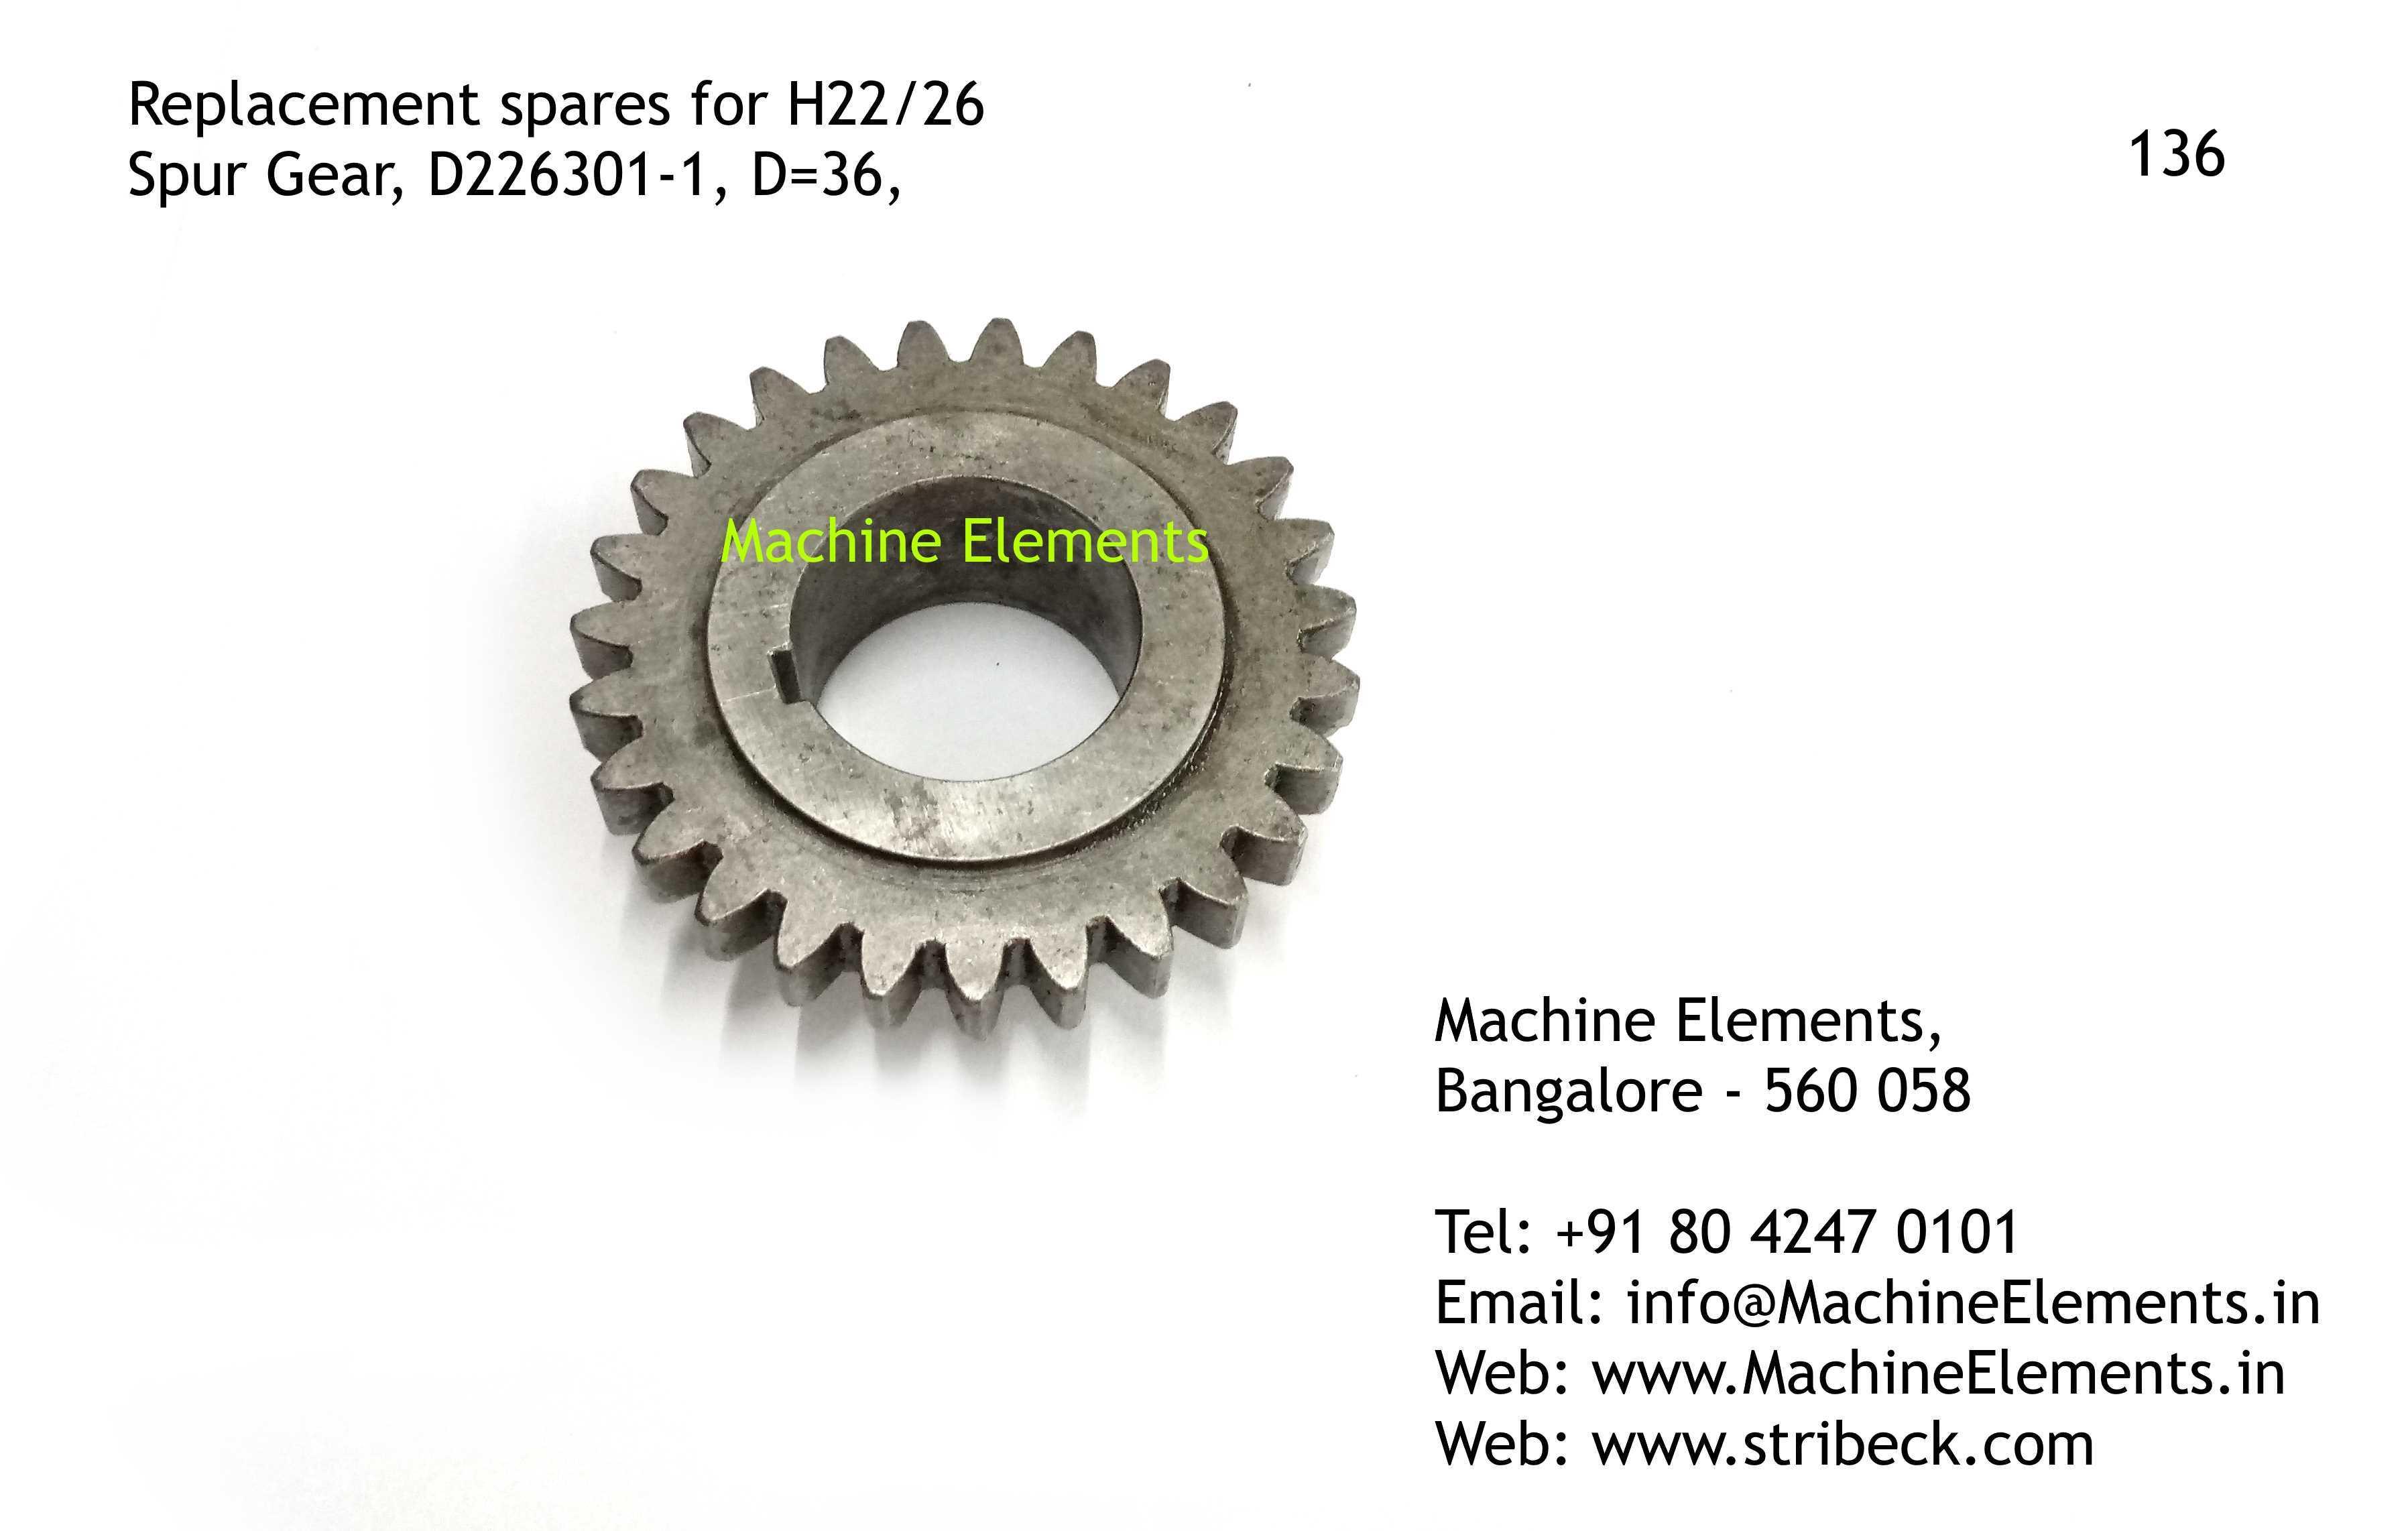 Spur Gear, D226301-1, D=36